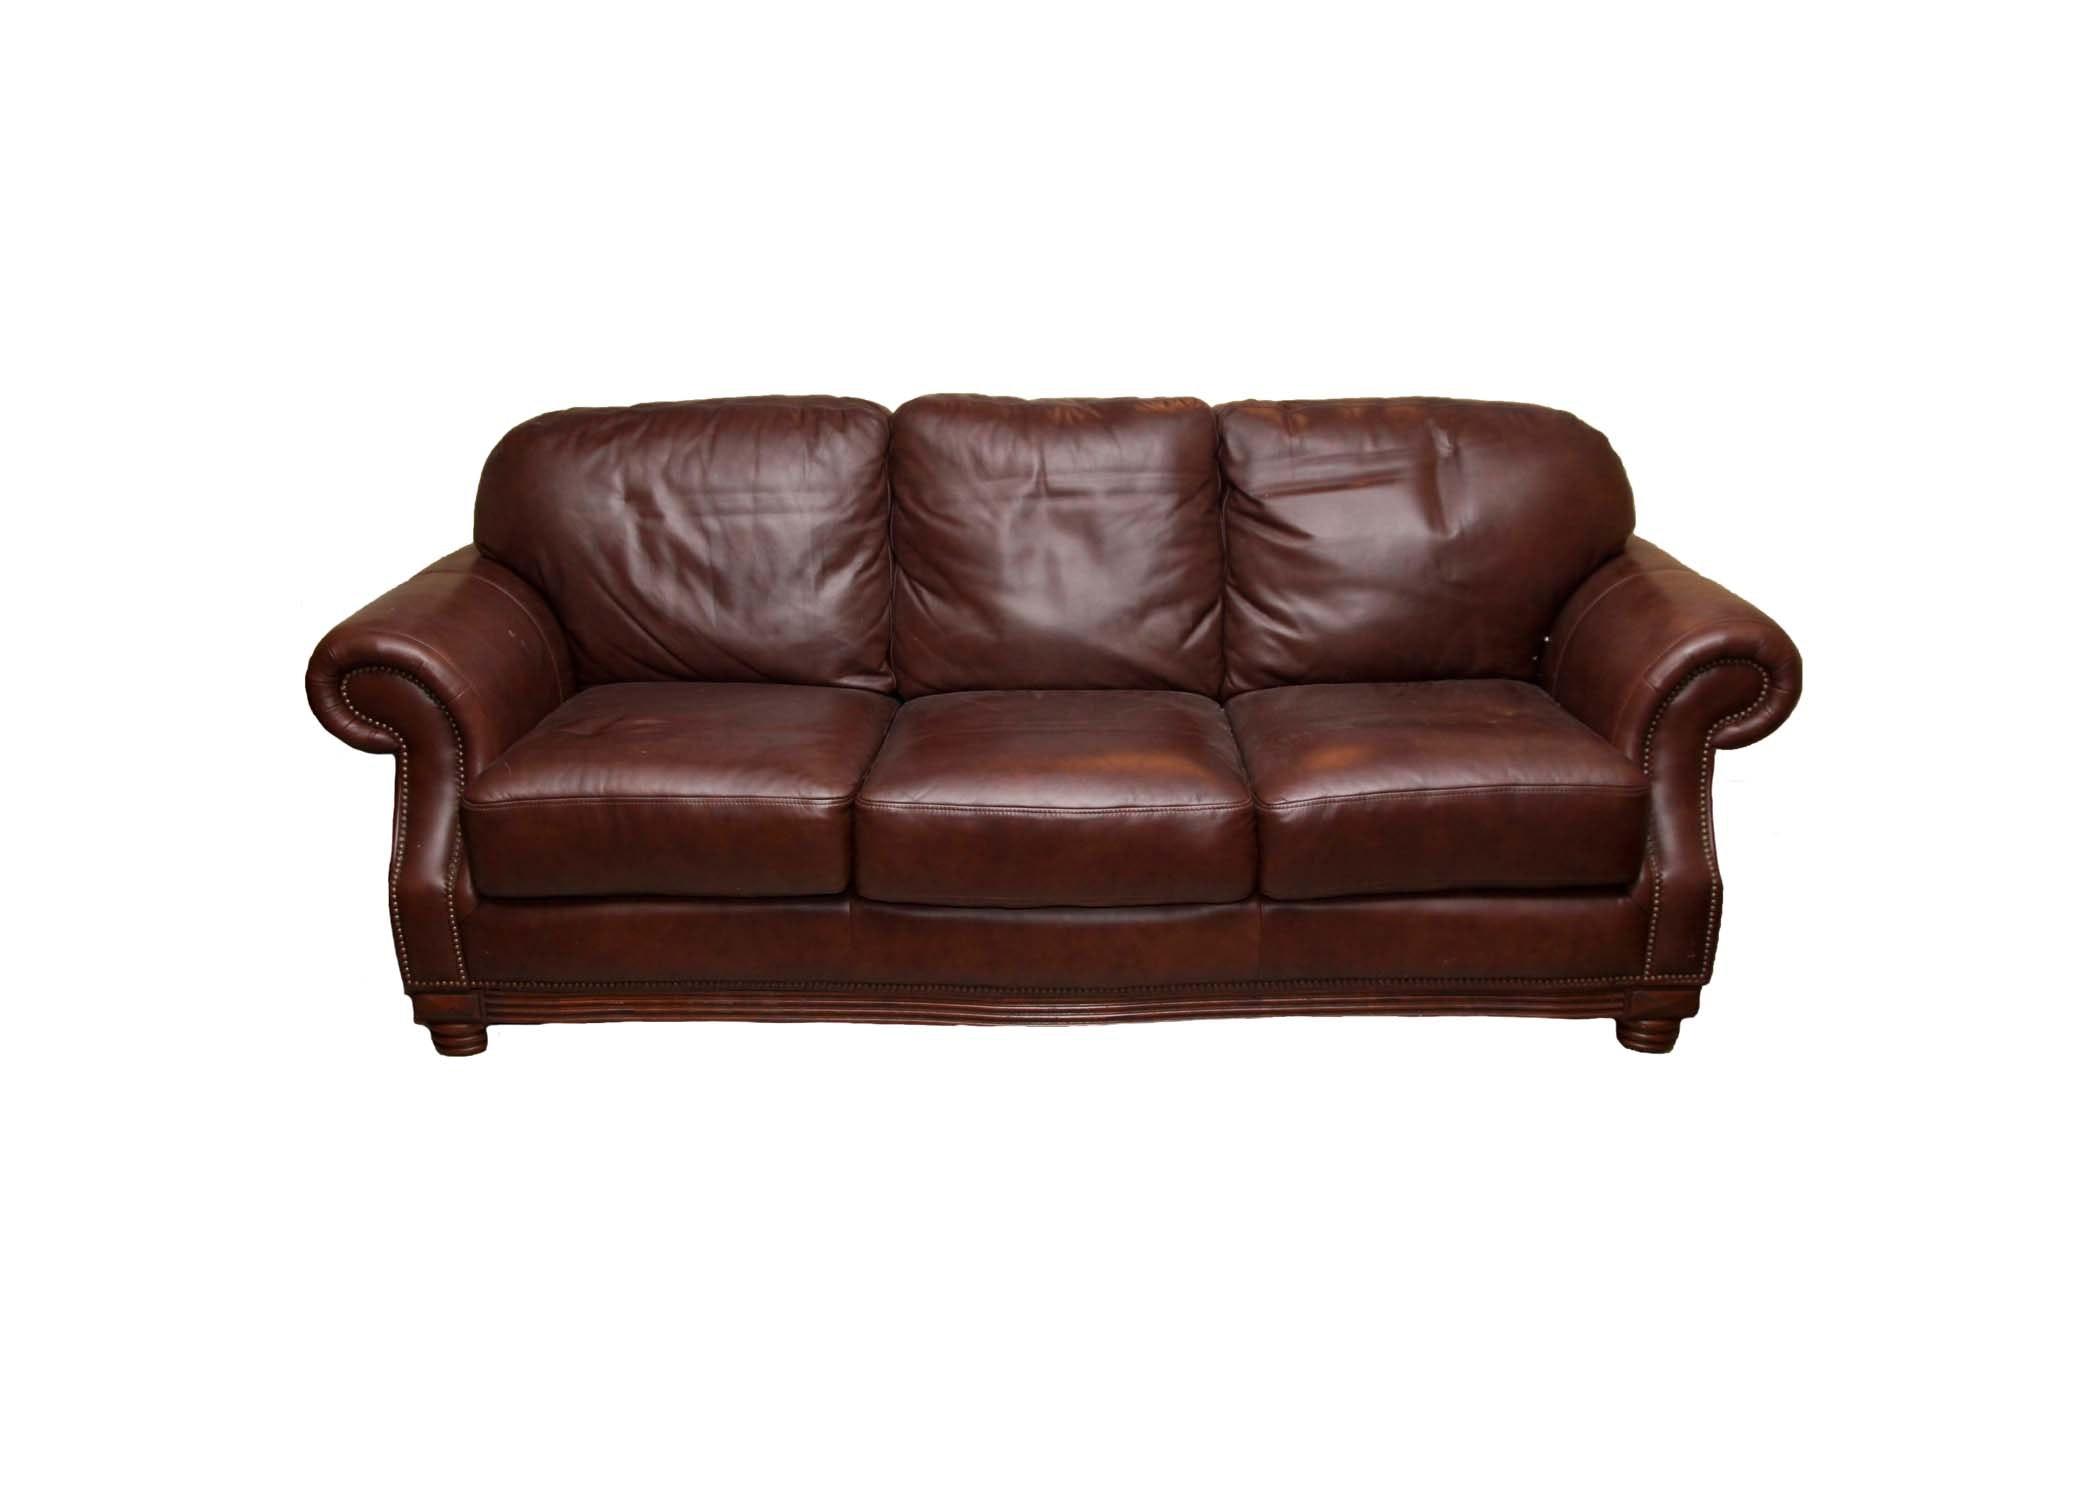 American Signature Leather Sofa